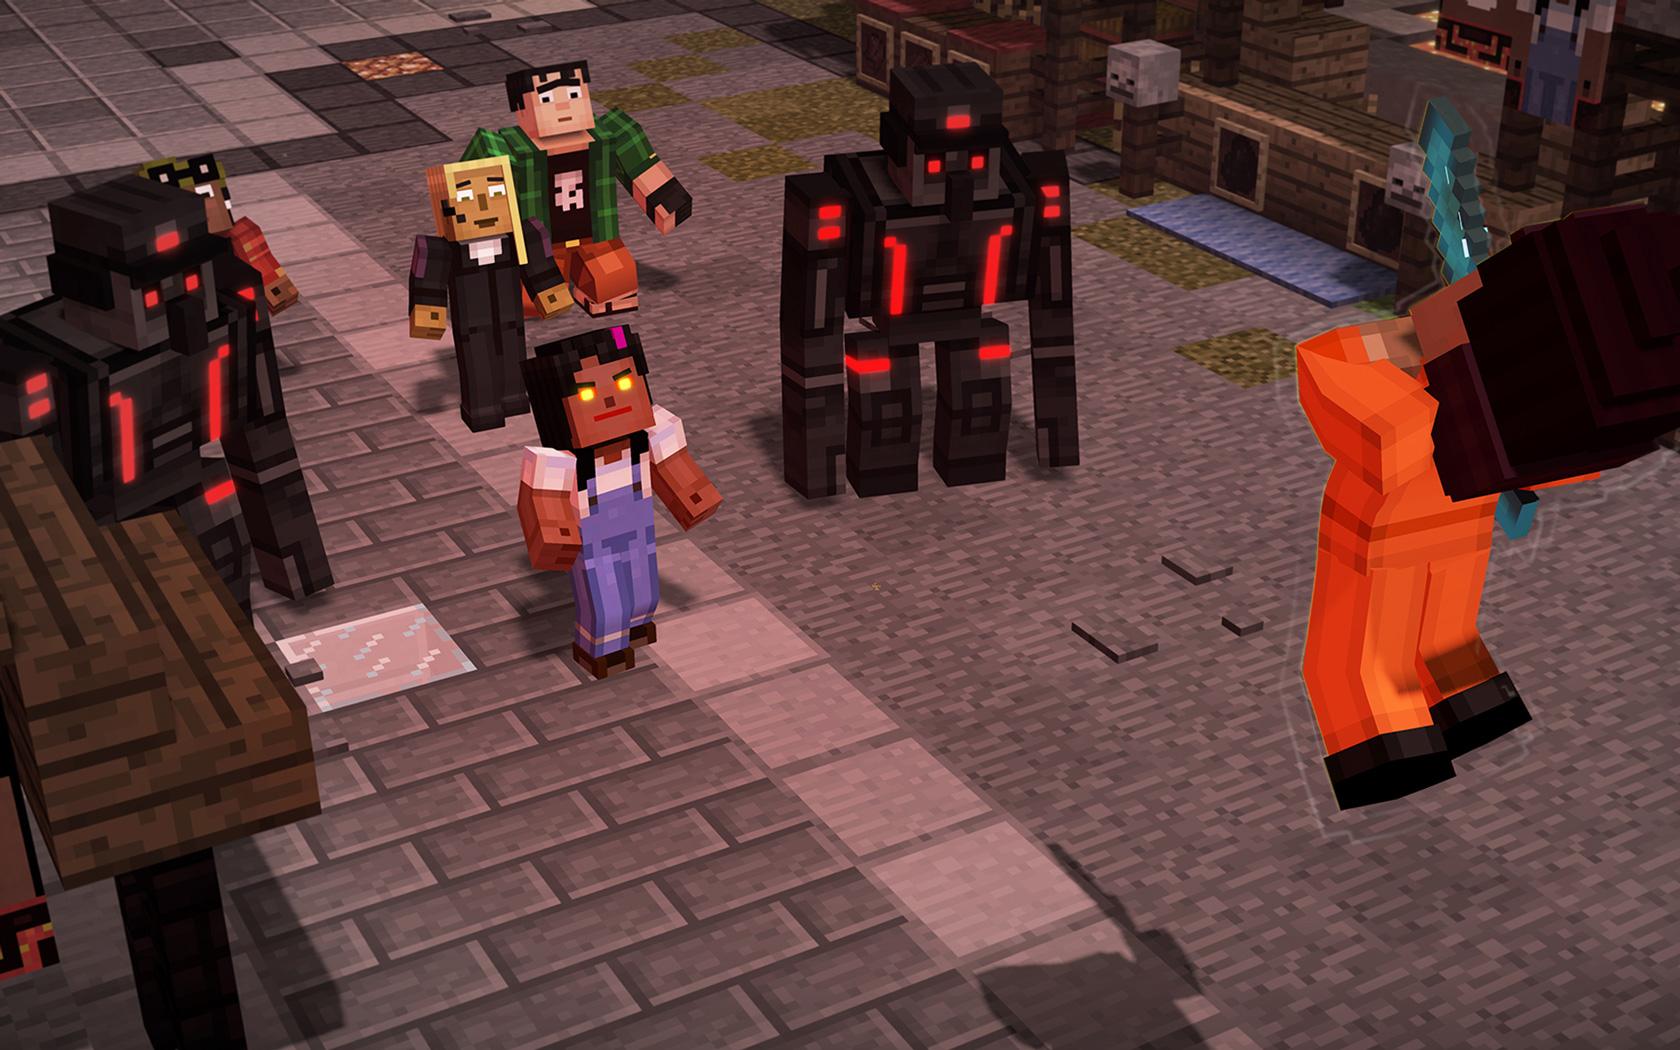 Free Minecraft: Story Mode Season 2 Wallpaper in 1680x1050